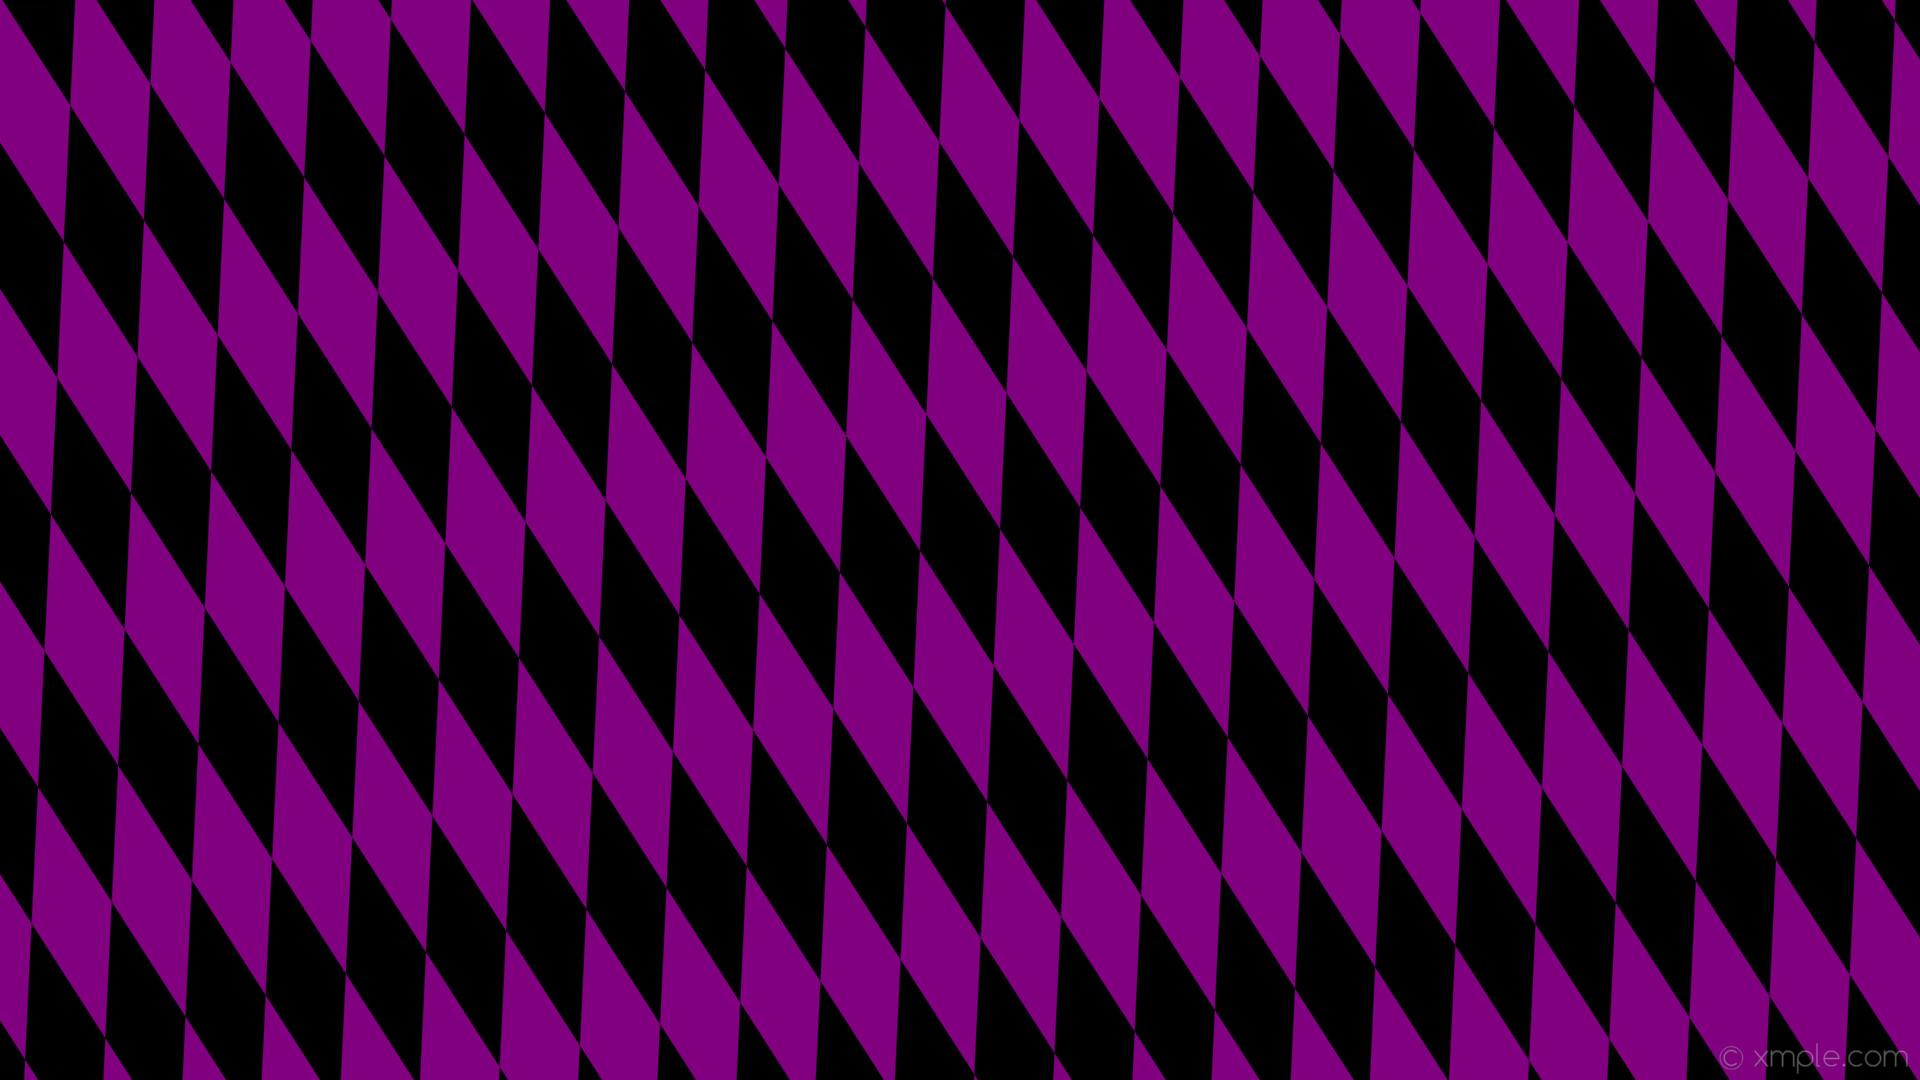 wallpaper lozenge black purple diamond rhombus #000000 #800080 105° 260px  83px